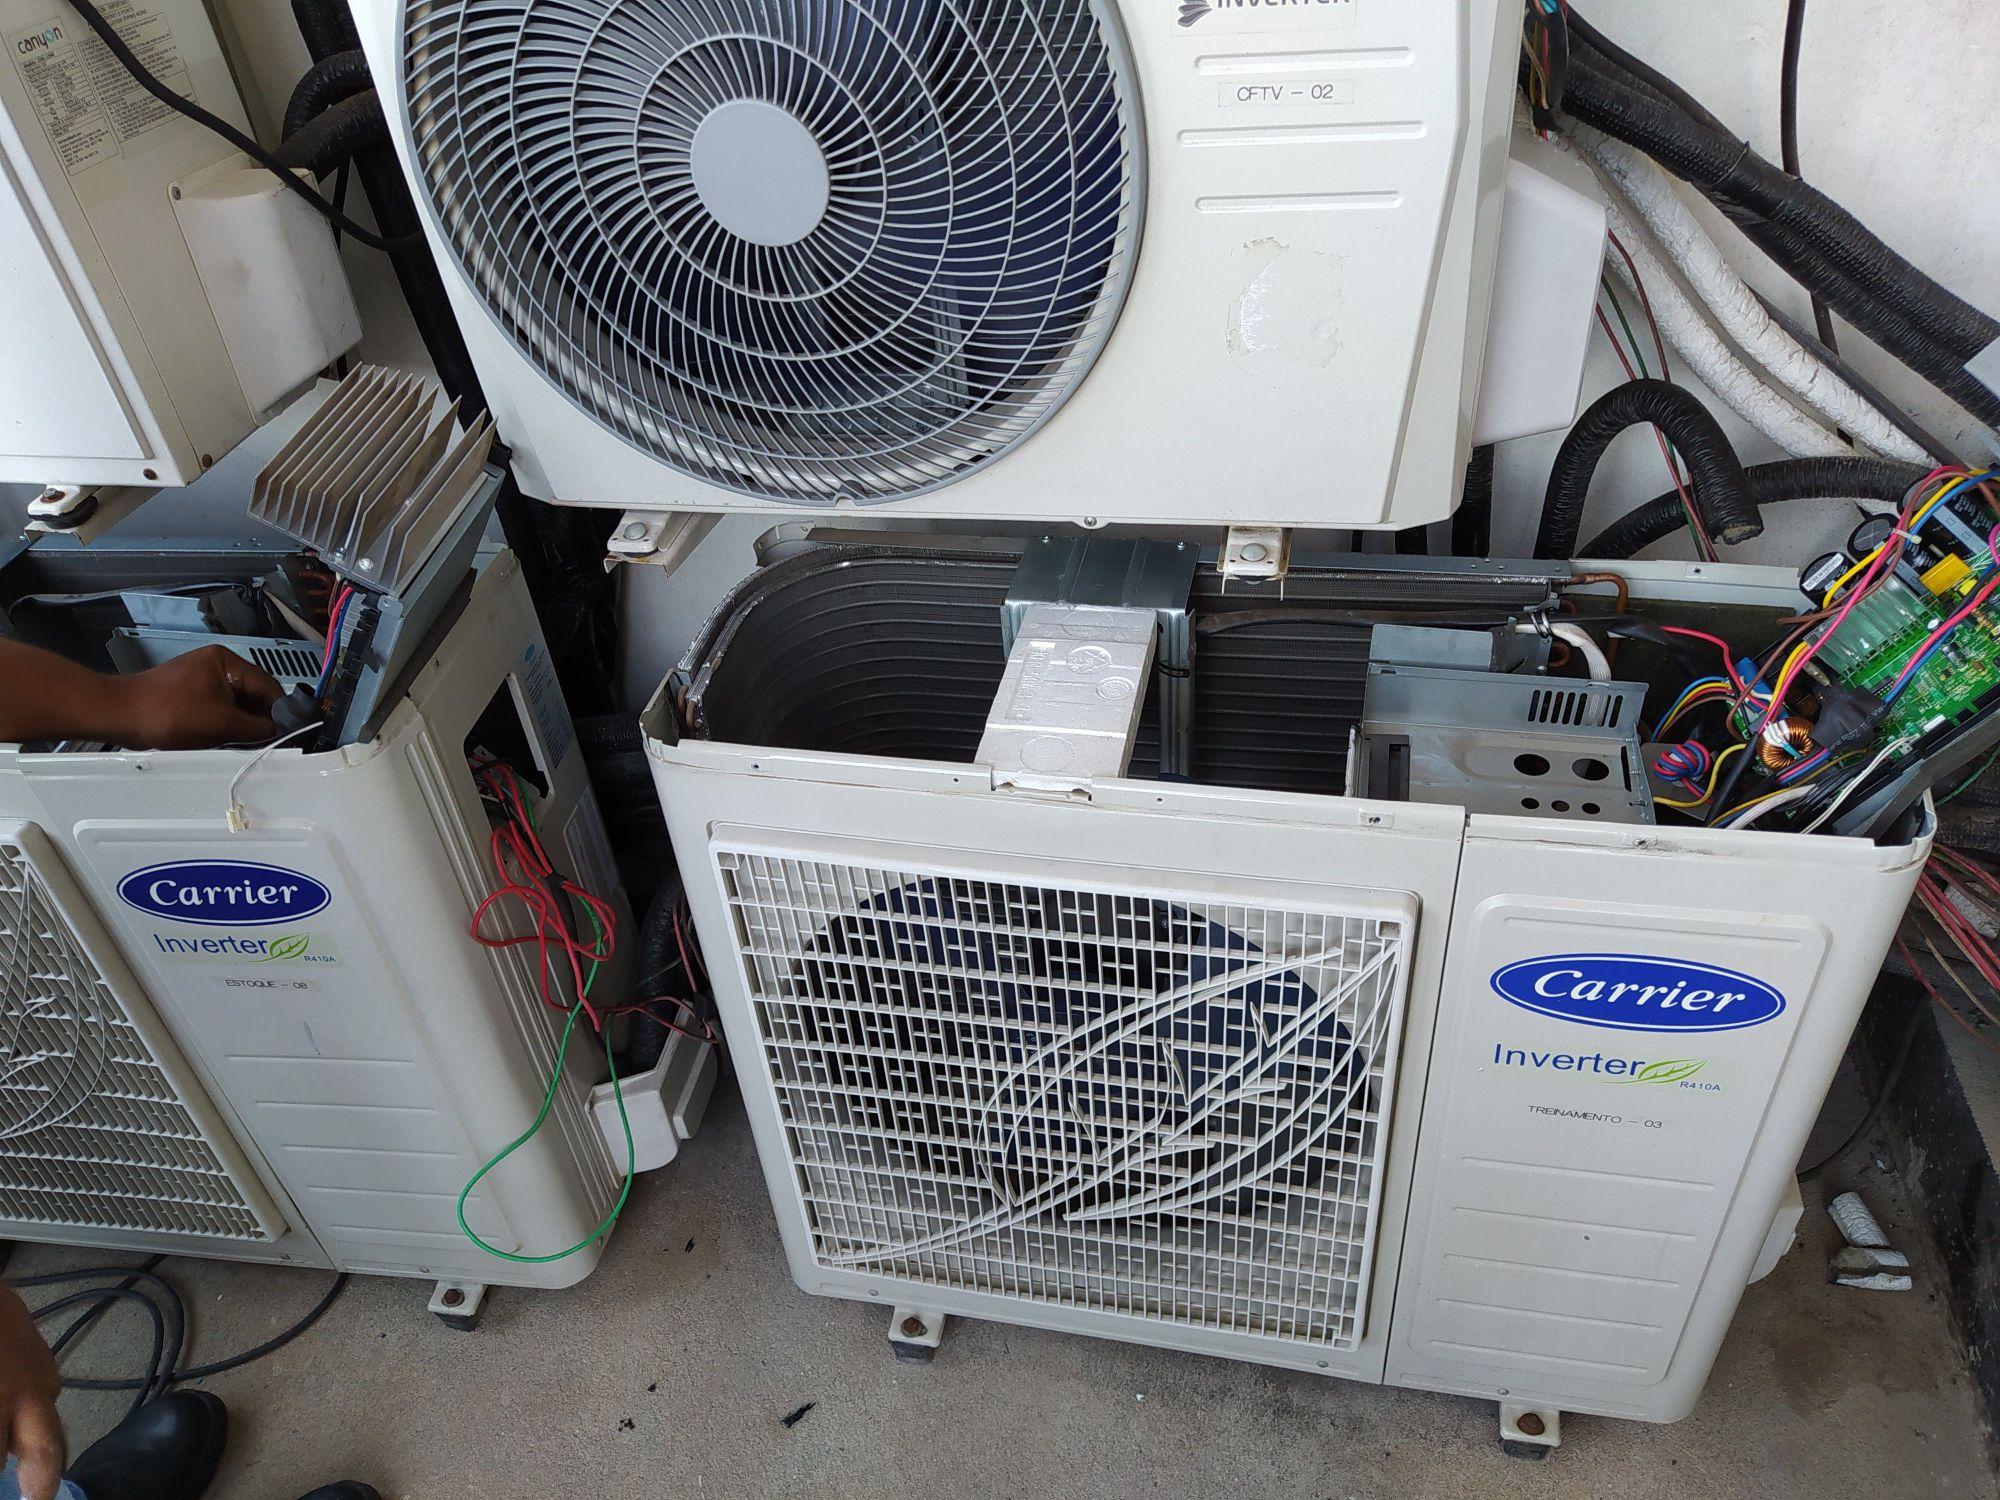 Análise da placa principal Inverter Carrier.